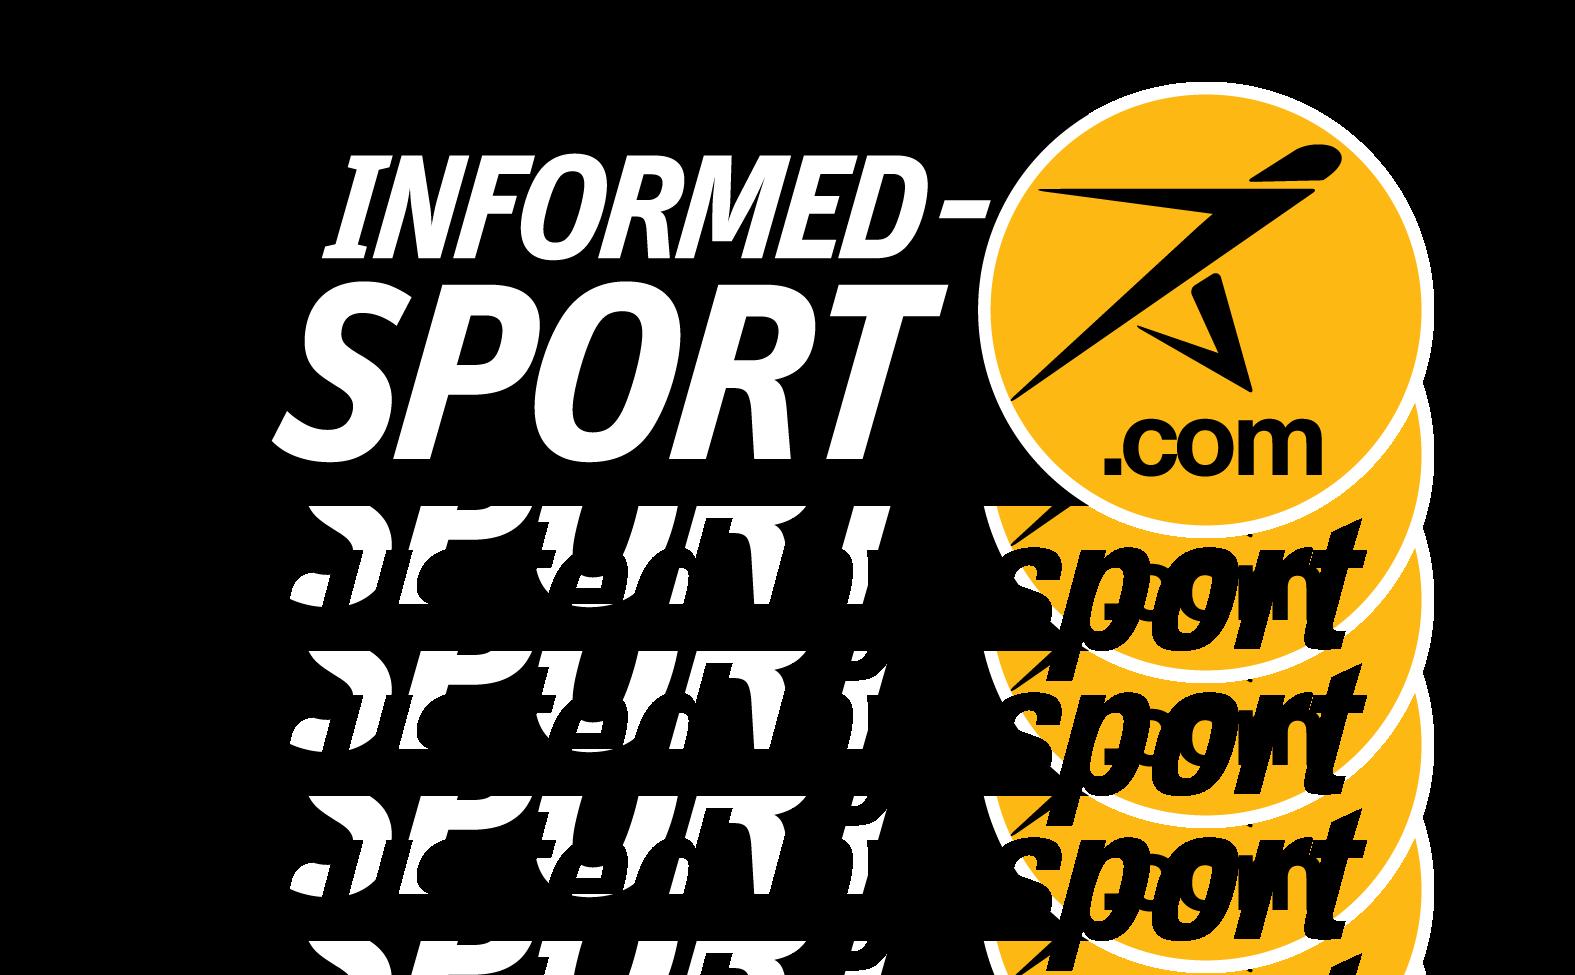 informed_sport_logo